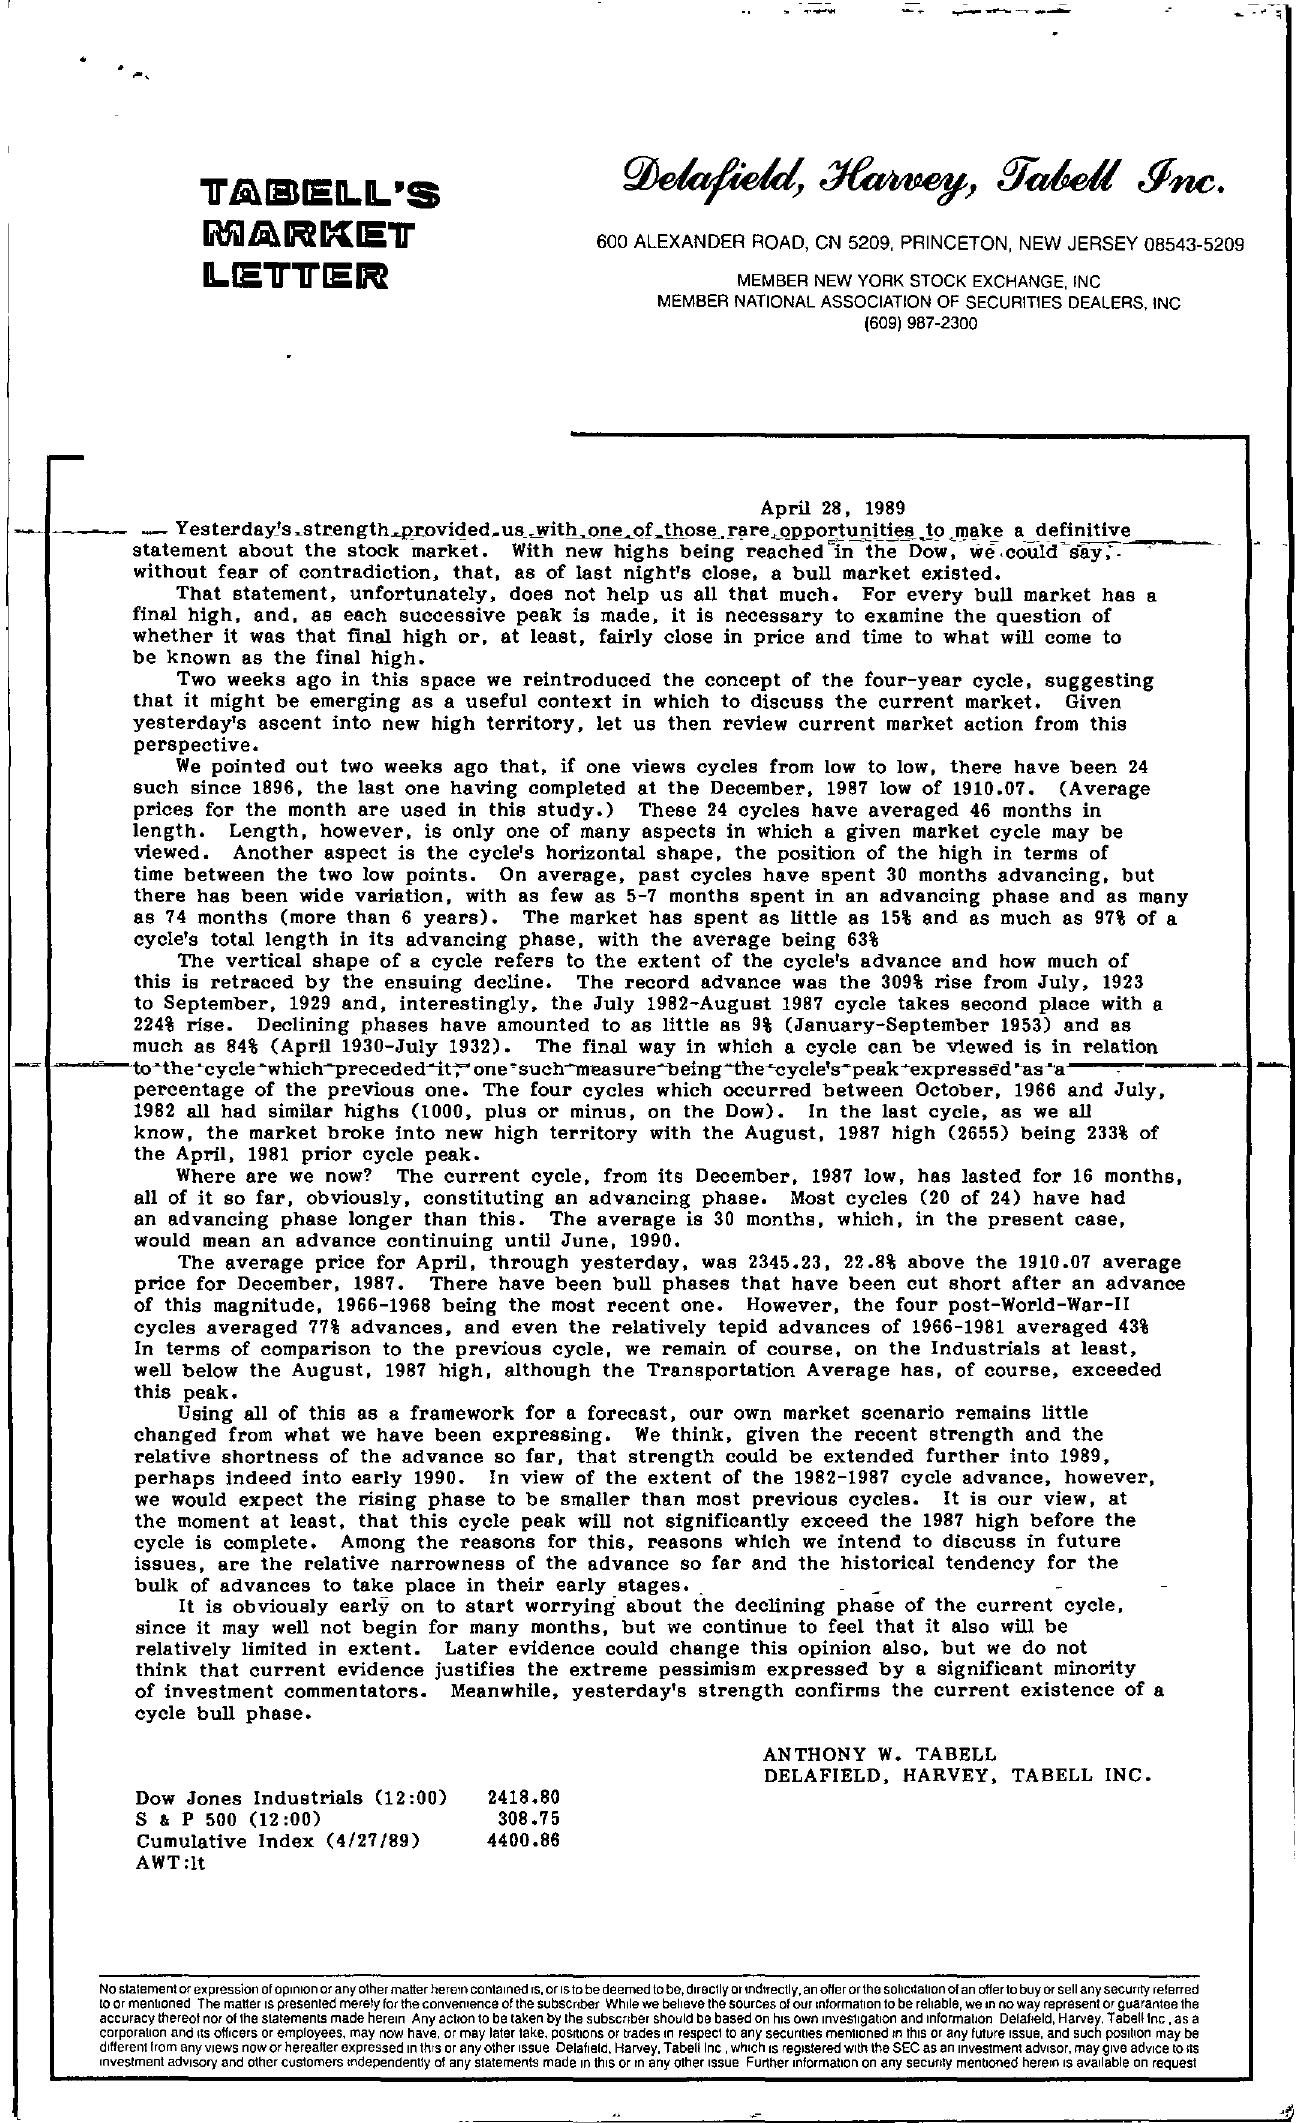 Tabell's Market Letter - April 28, 1989